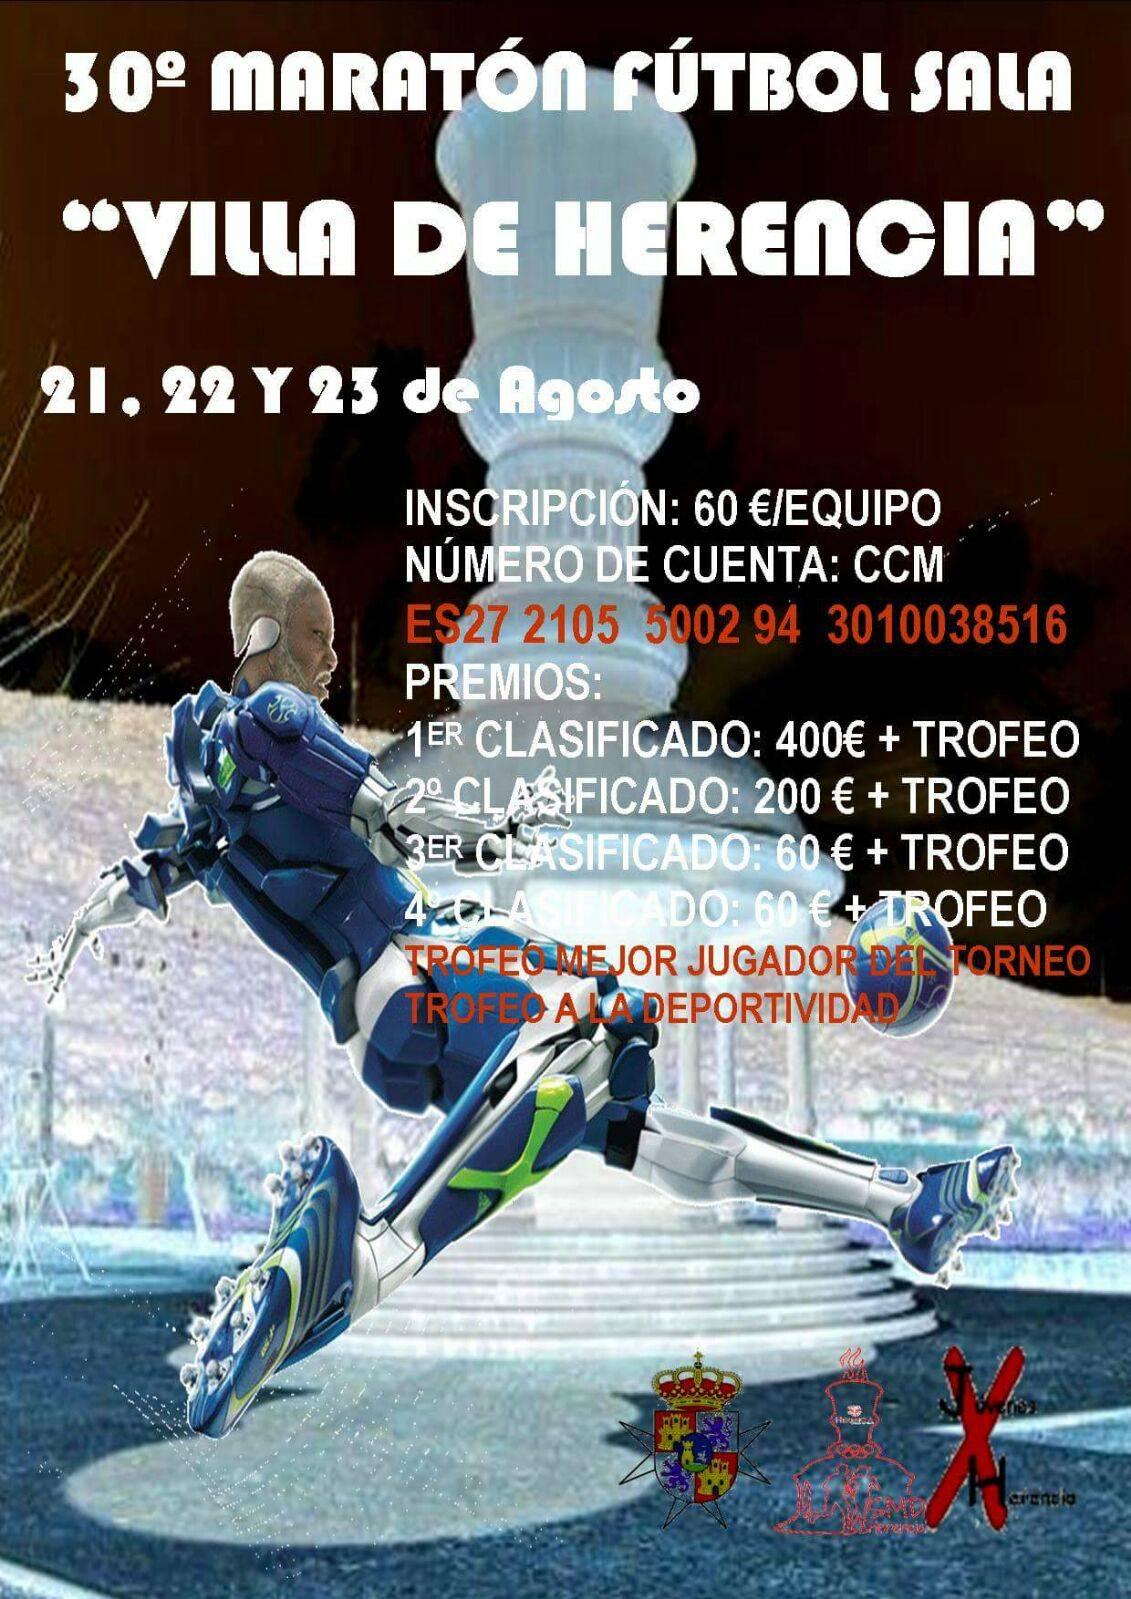 "30 maraton futbol sala herencia - 30 Maratón Fútbol Sala ""Villa de Herencia"""